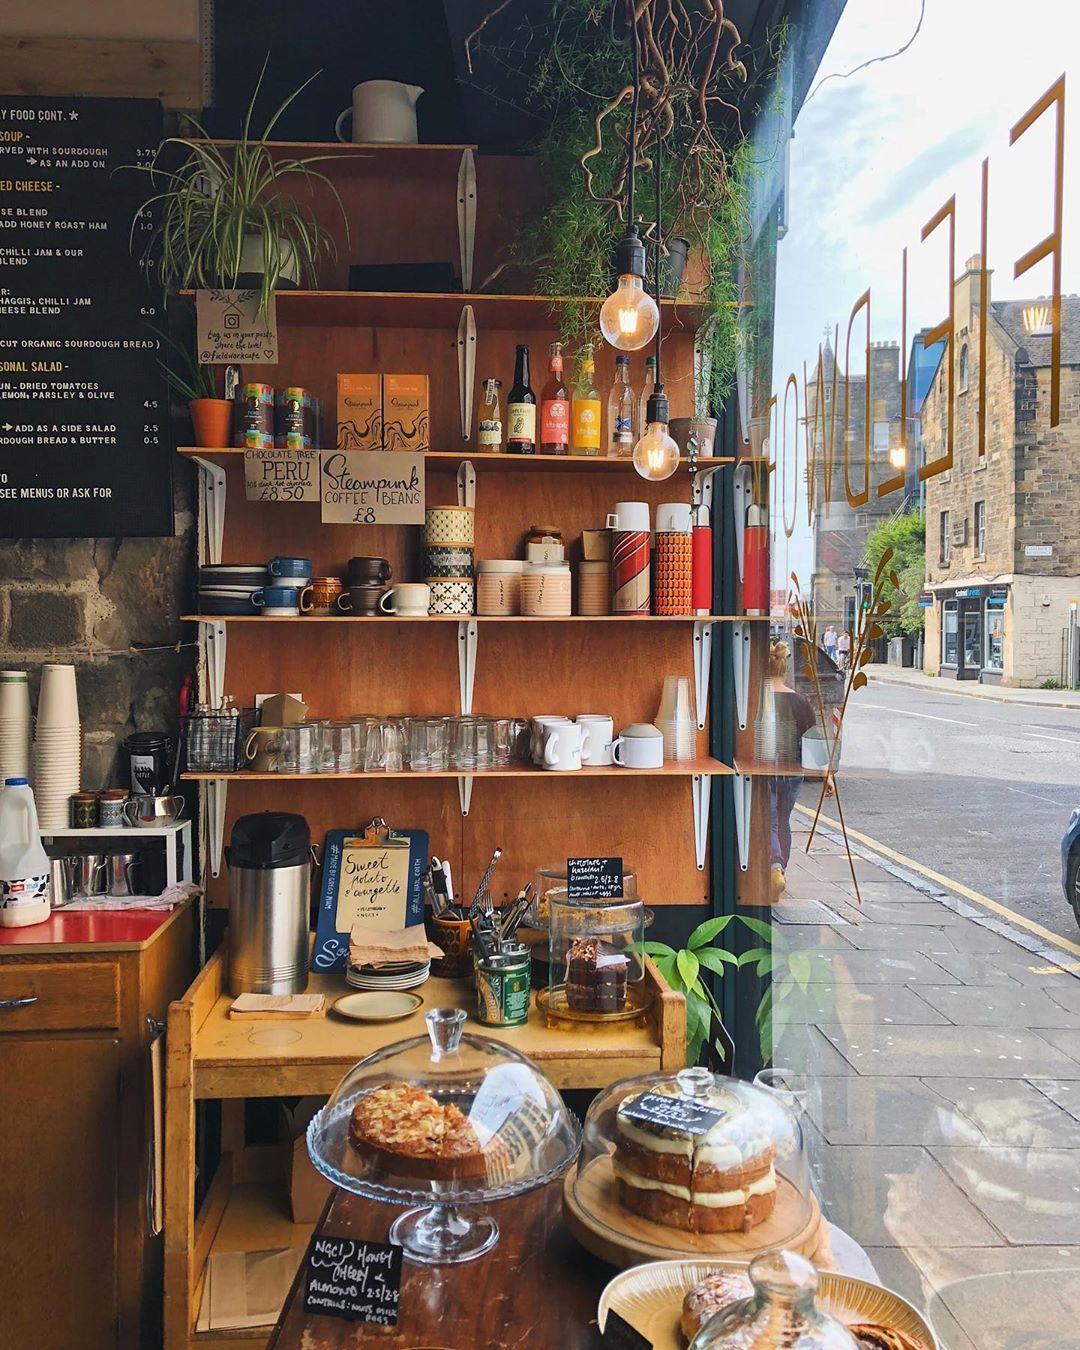 "juan.   lifestyle + travel on Instagram: ""a slice of cake and a flat white is always a good idea at @fieldworkcafe ☕️🍰 - - - - #edinburgh #scotland #igersedinburgh #thisisedinburgh…"""